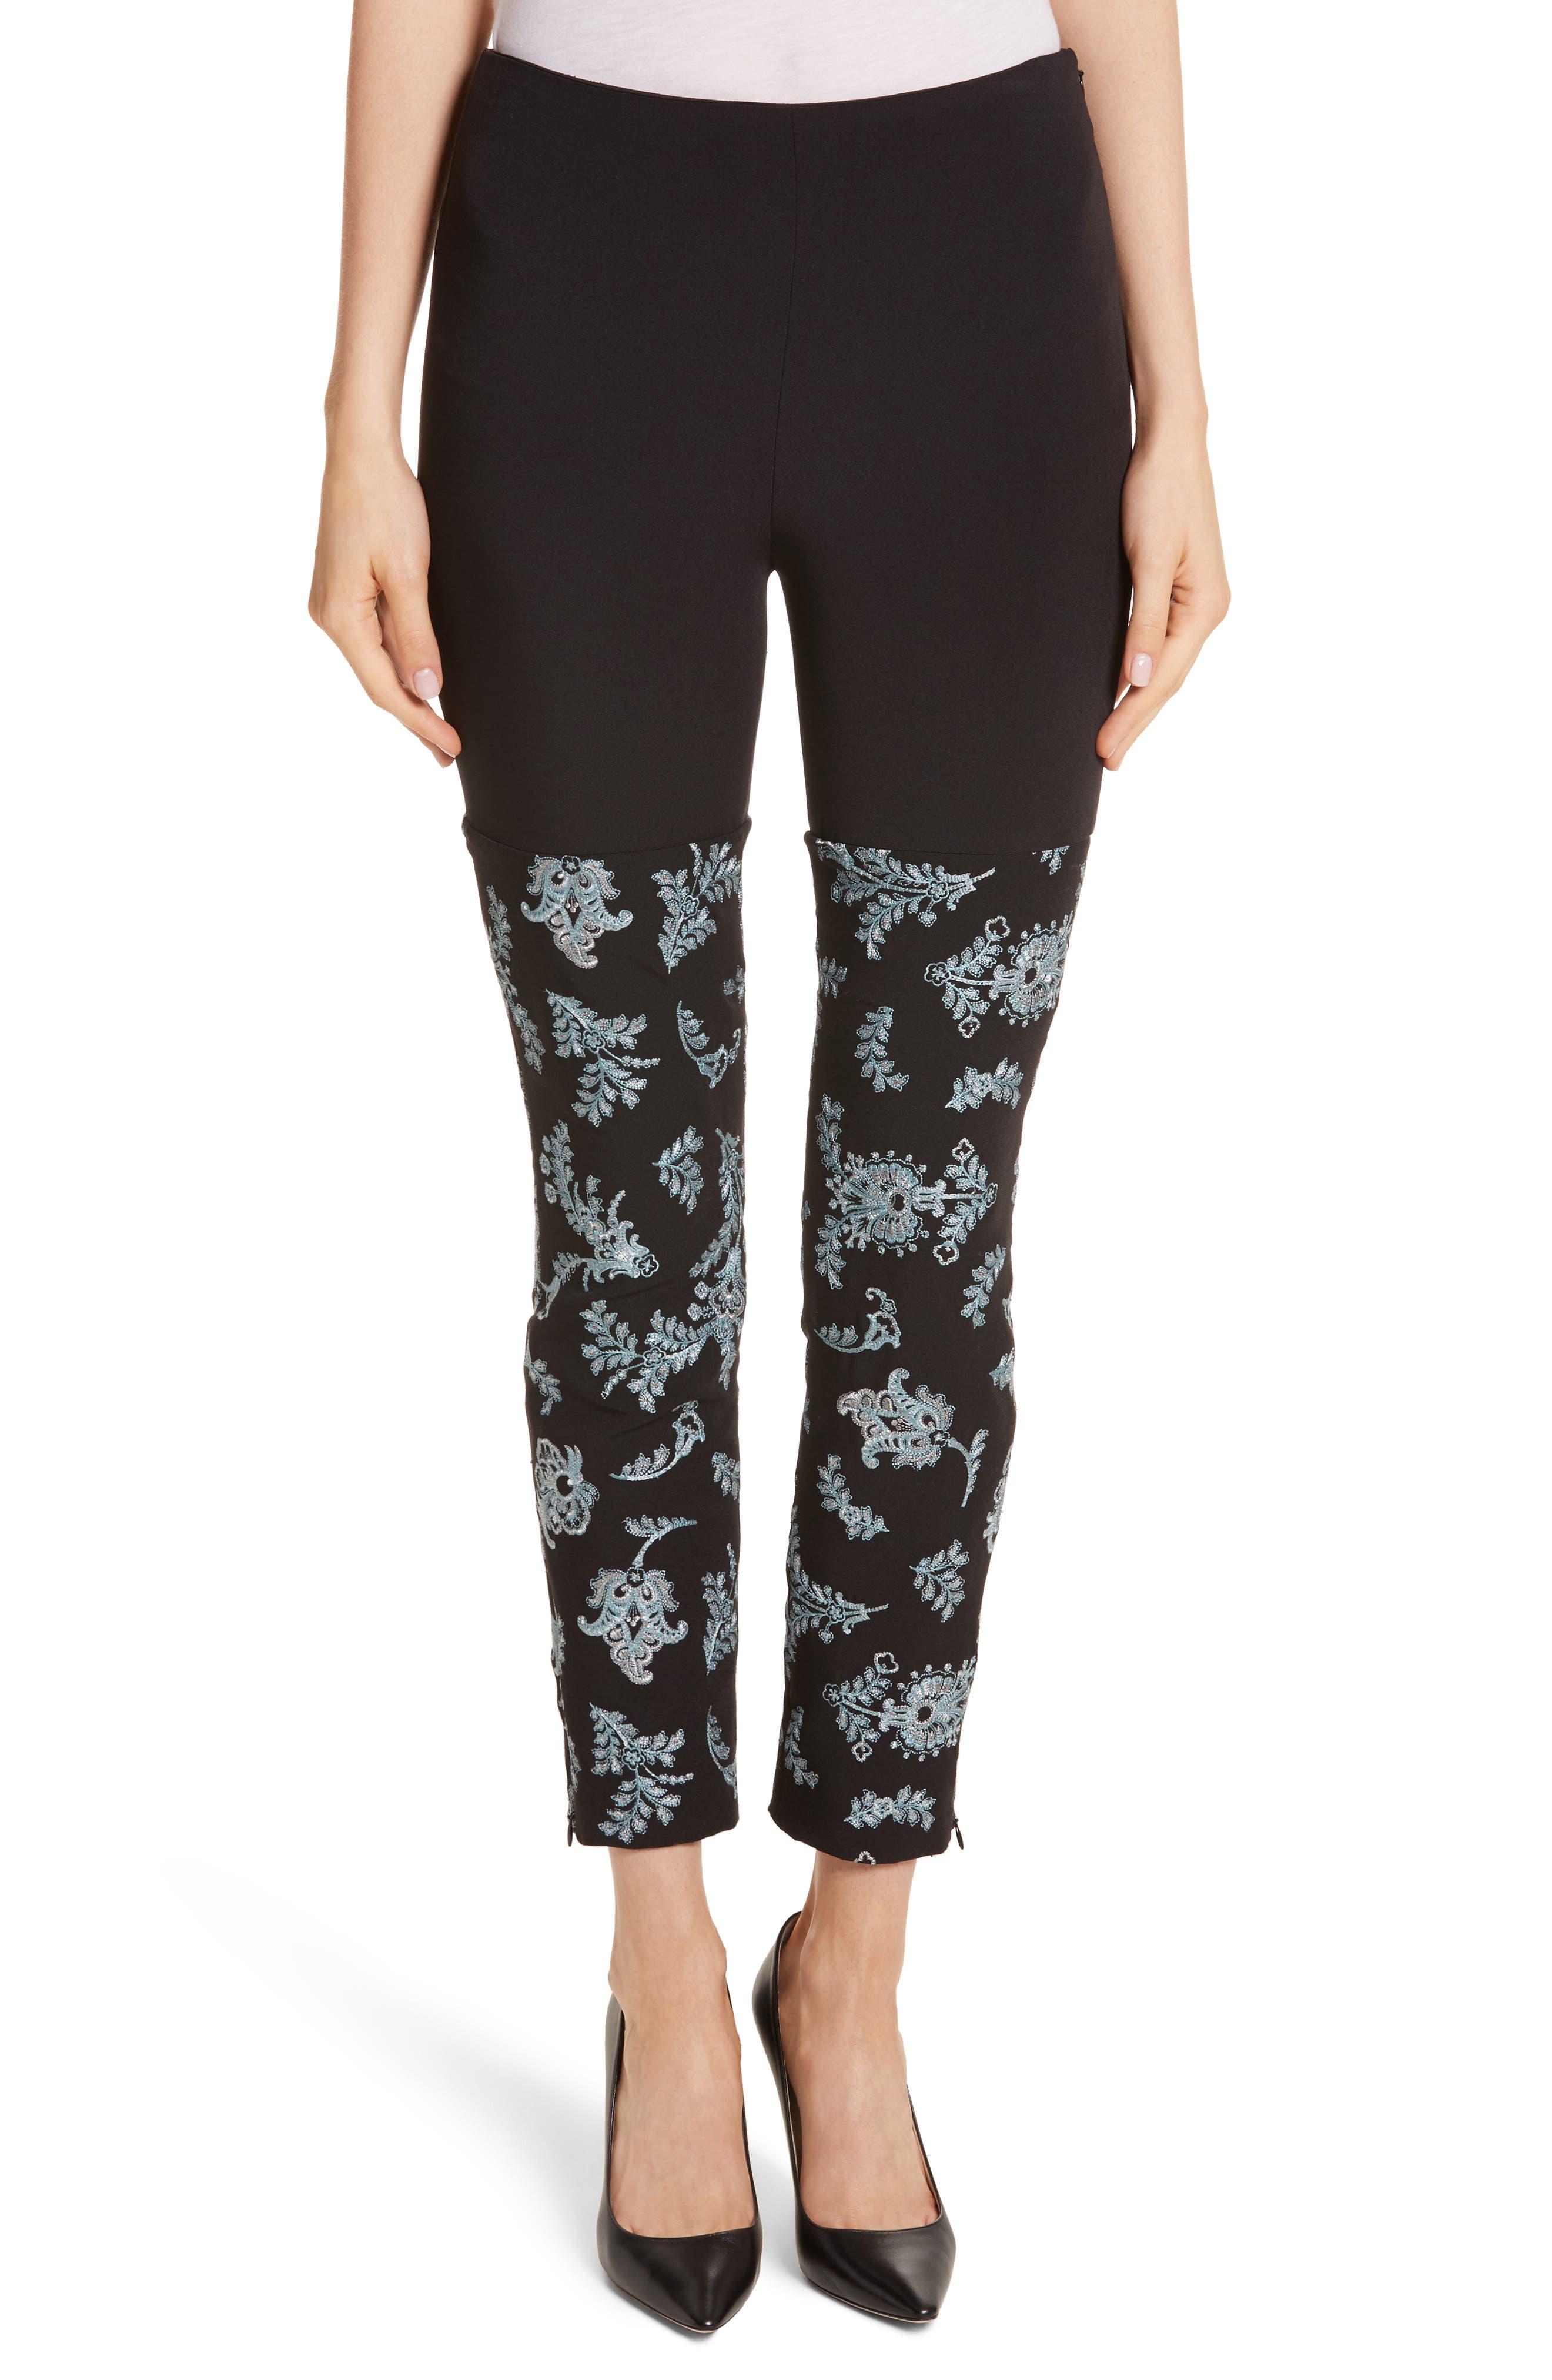 Marin Embroidered Leggings,                         Main,                         color, Black/ Silver/ Sunshower